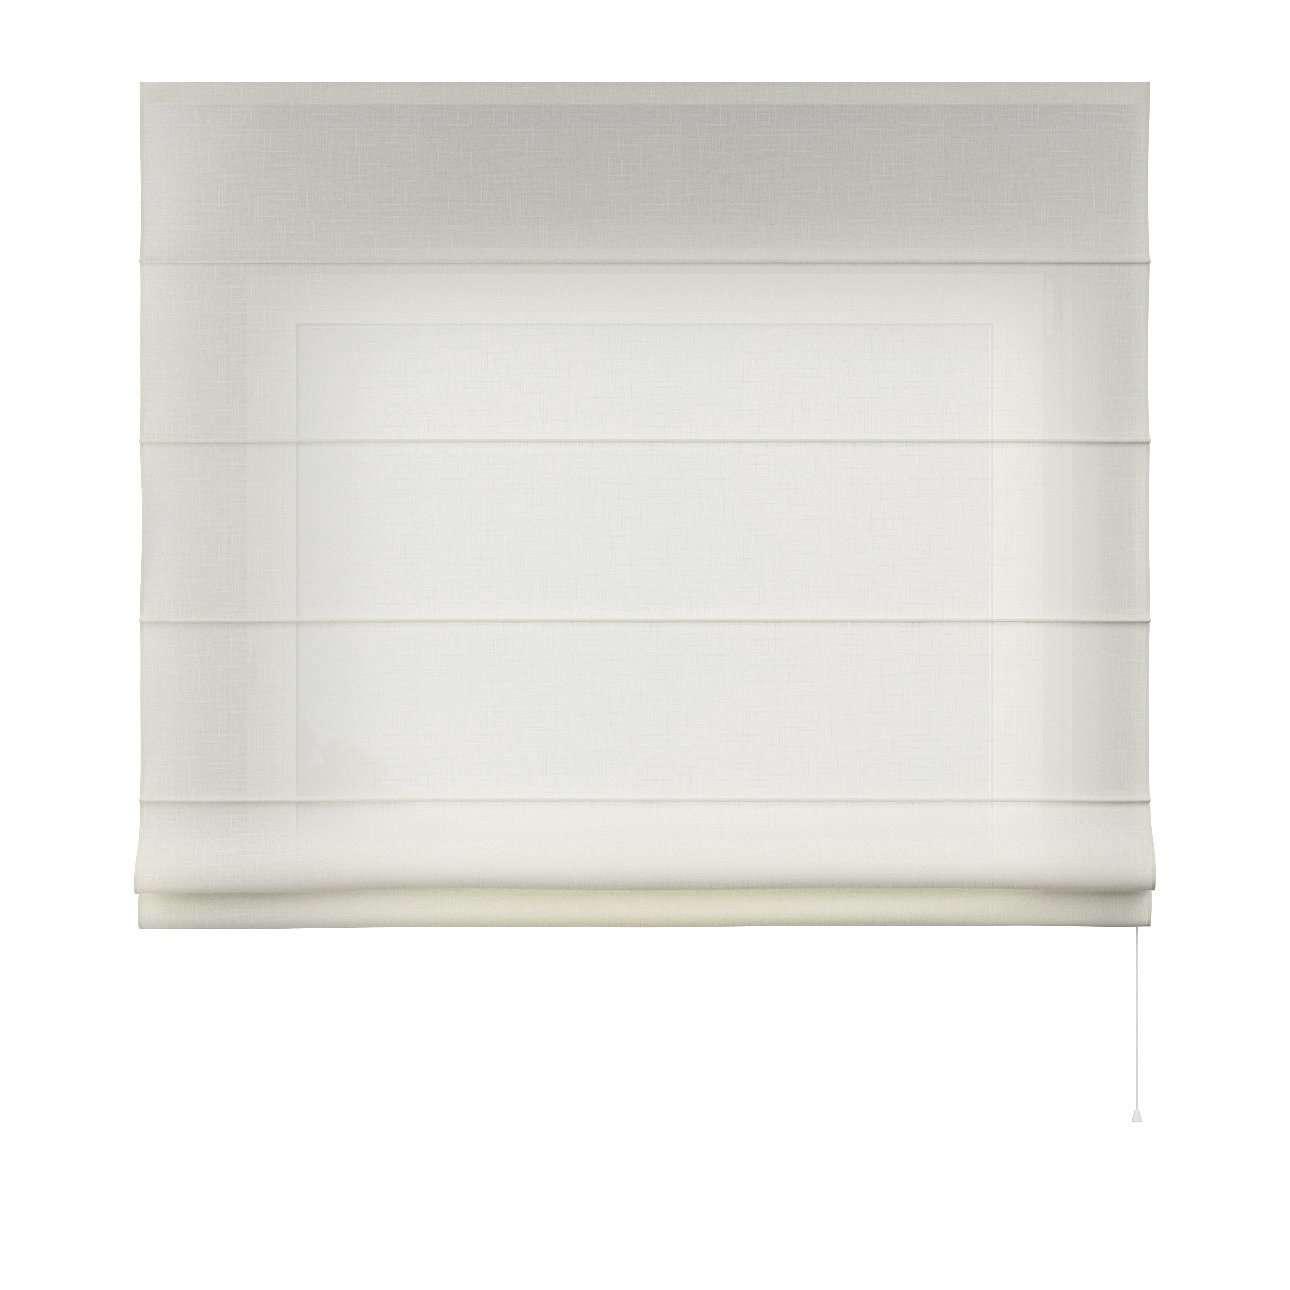 Romanetės Capri 80 x 170 cm (plotis x ilgis) kolekcijoje Romantica, audinys: 128-88